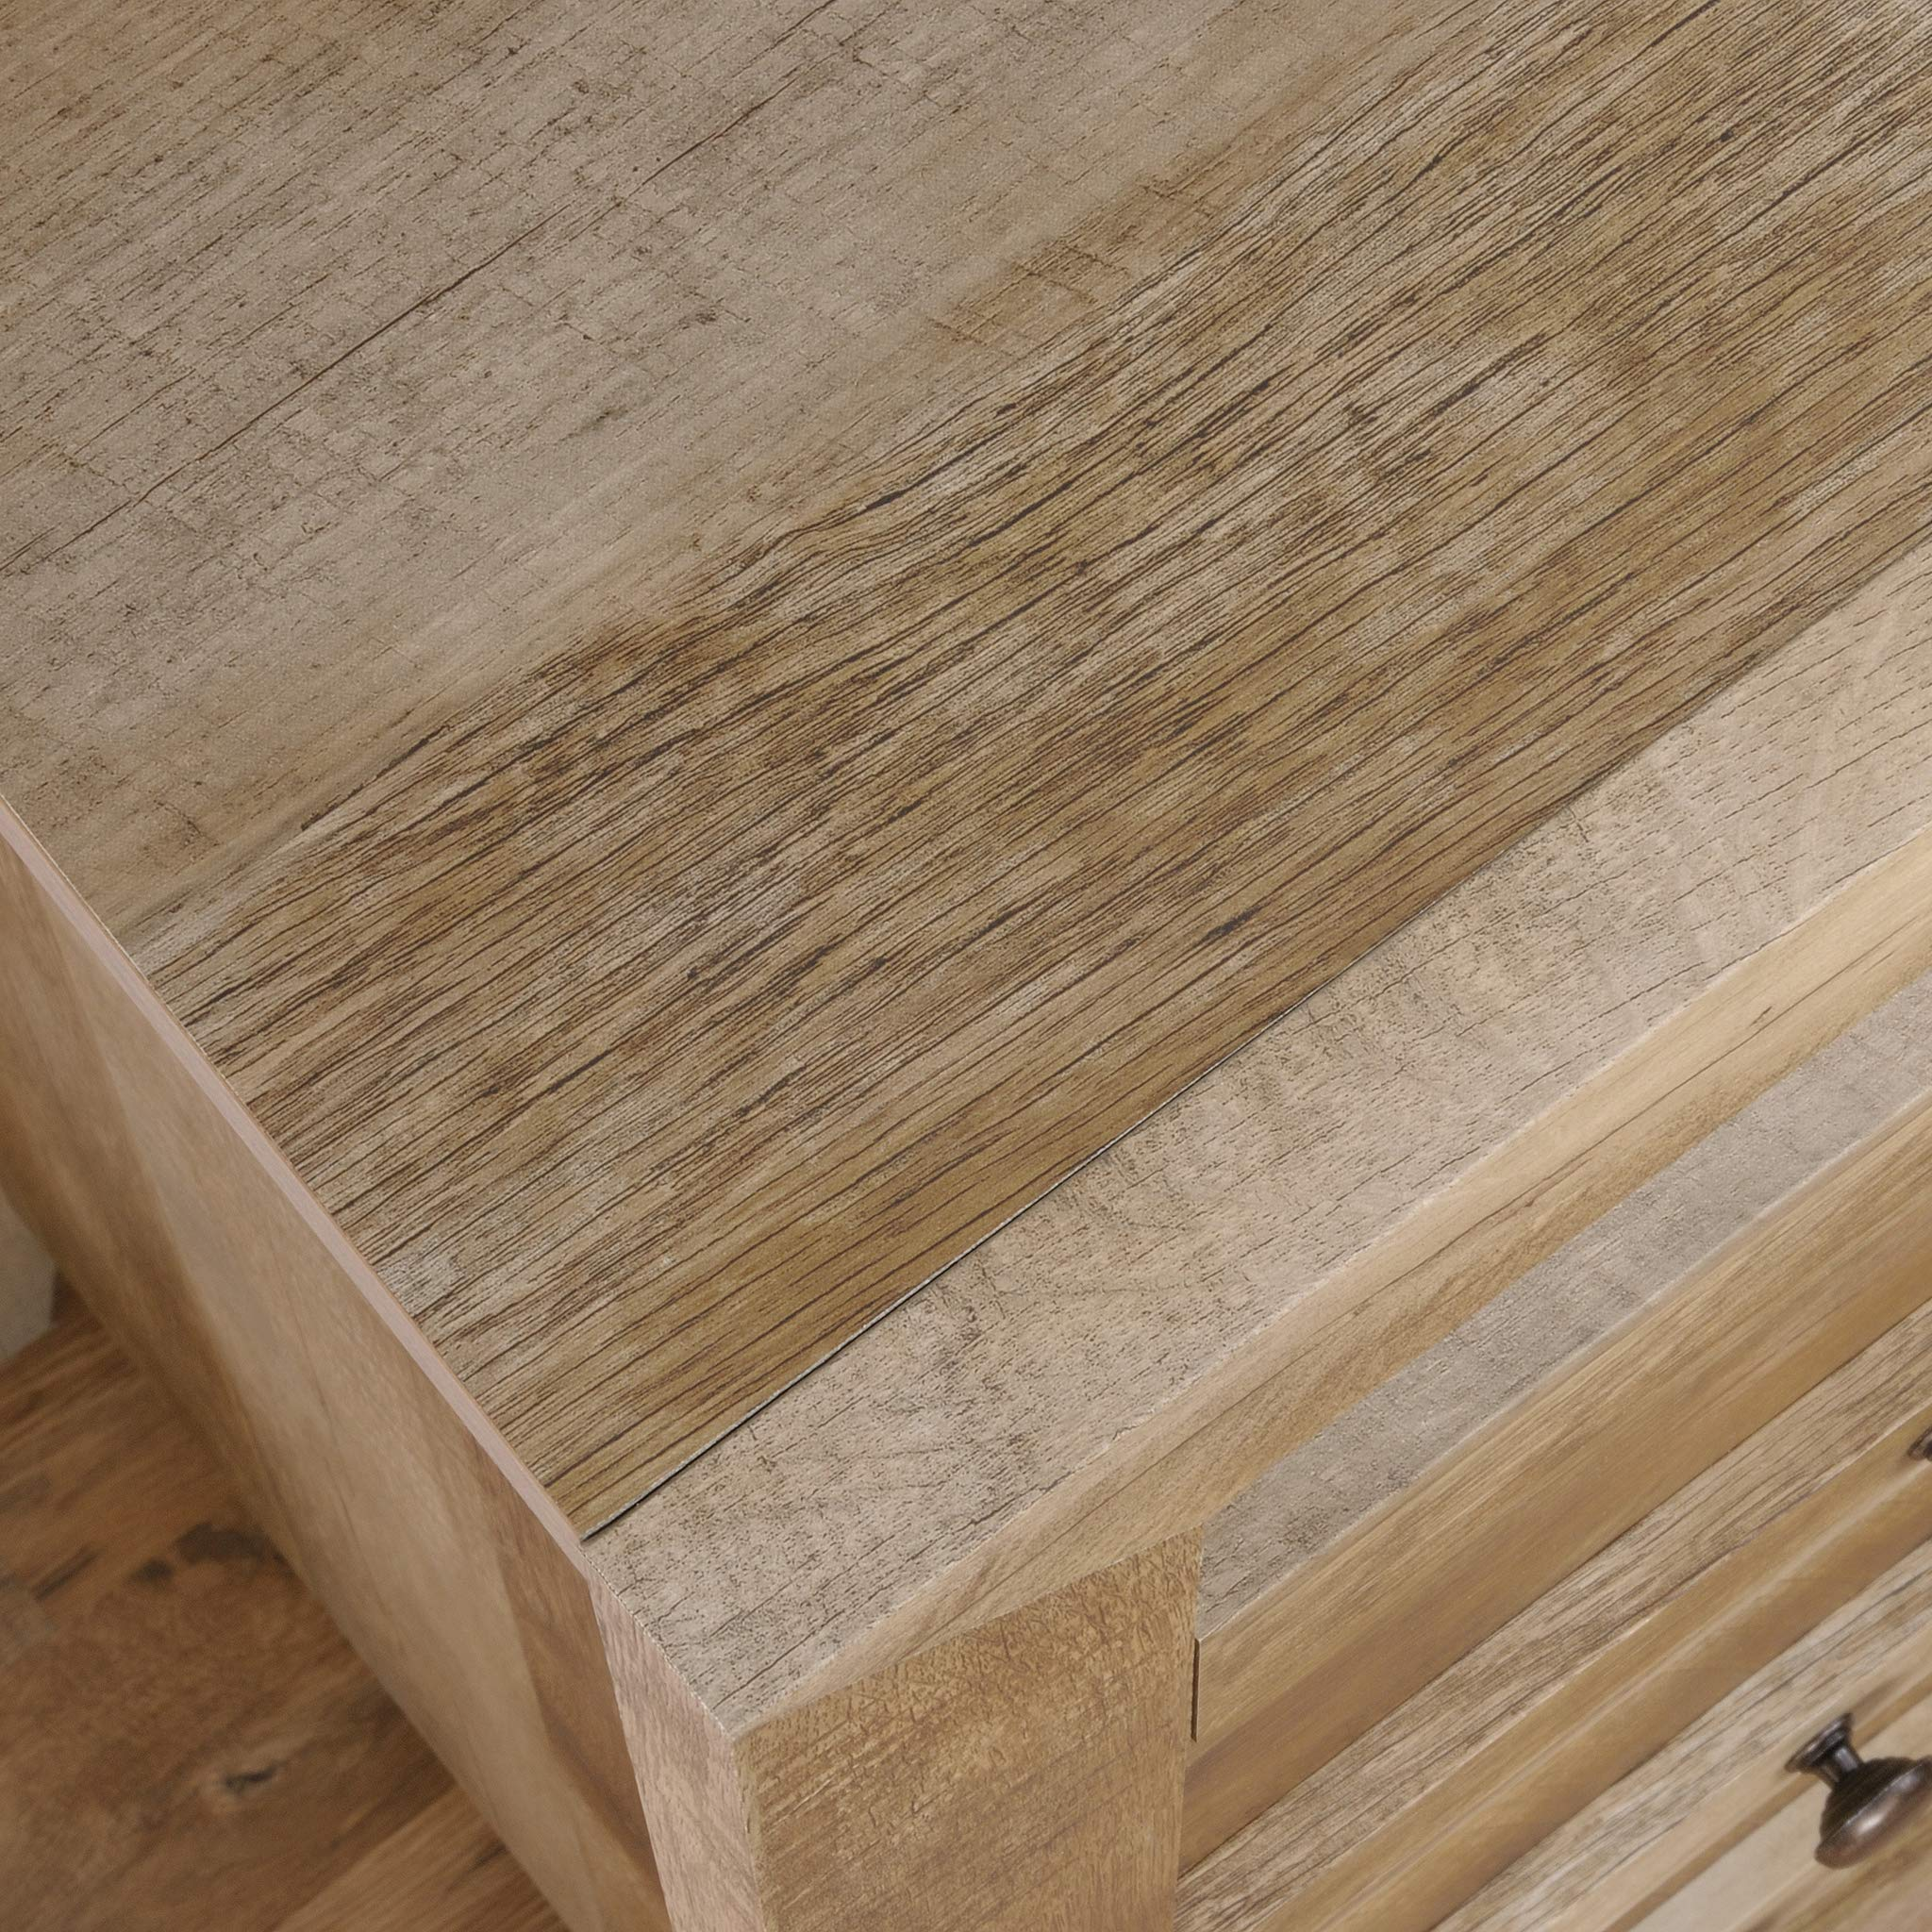 Sauder 418175 Dakota Pass 4-Drawer Chest, L: 32.68'' x W: 17.52'' x H: 43.23'', Craftsman Oak finish by Sauder (Image #9)